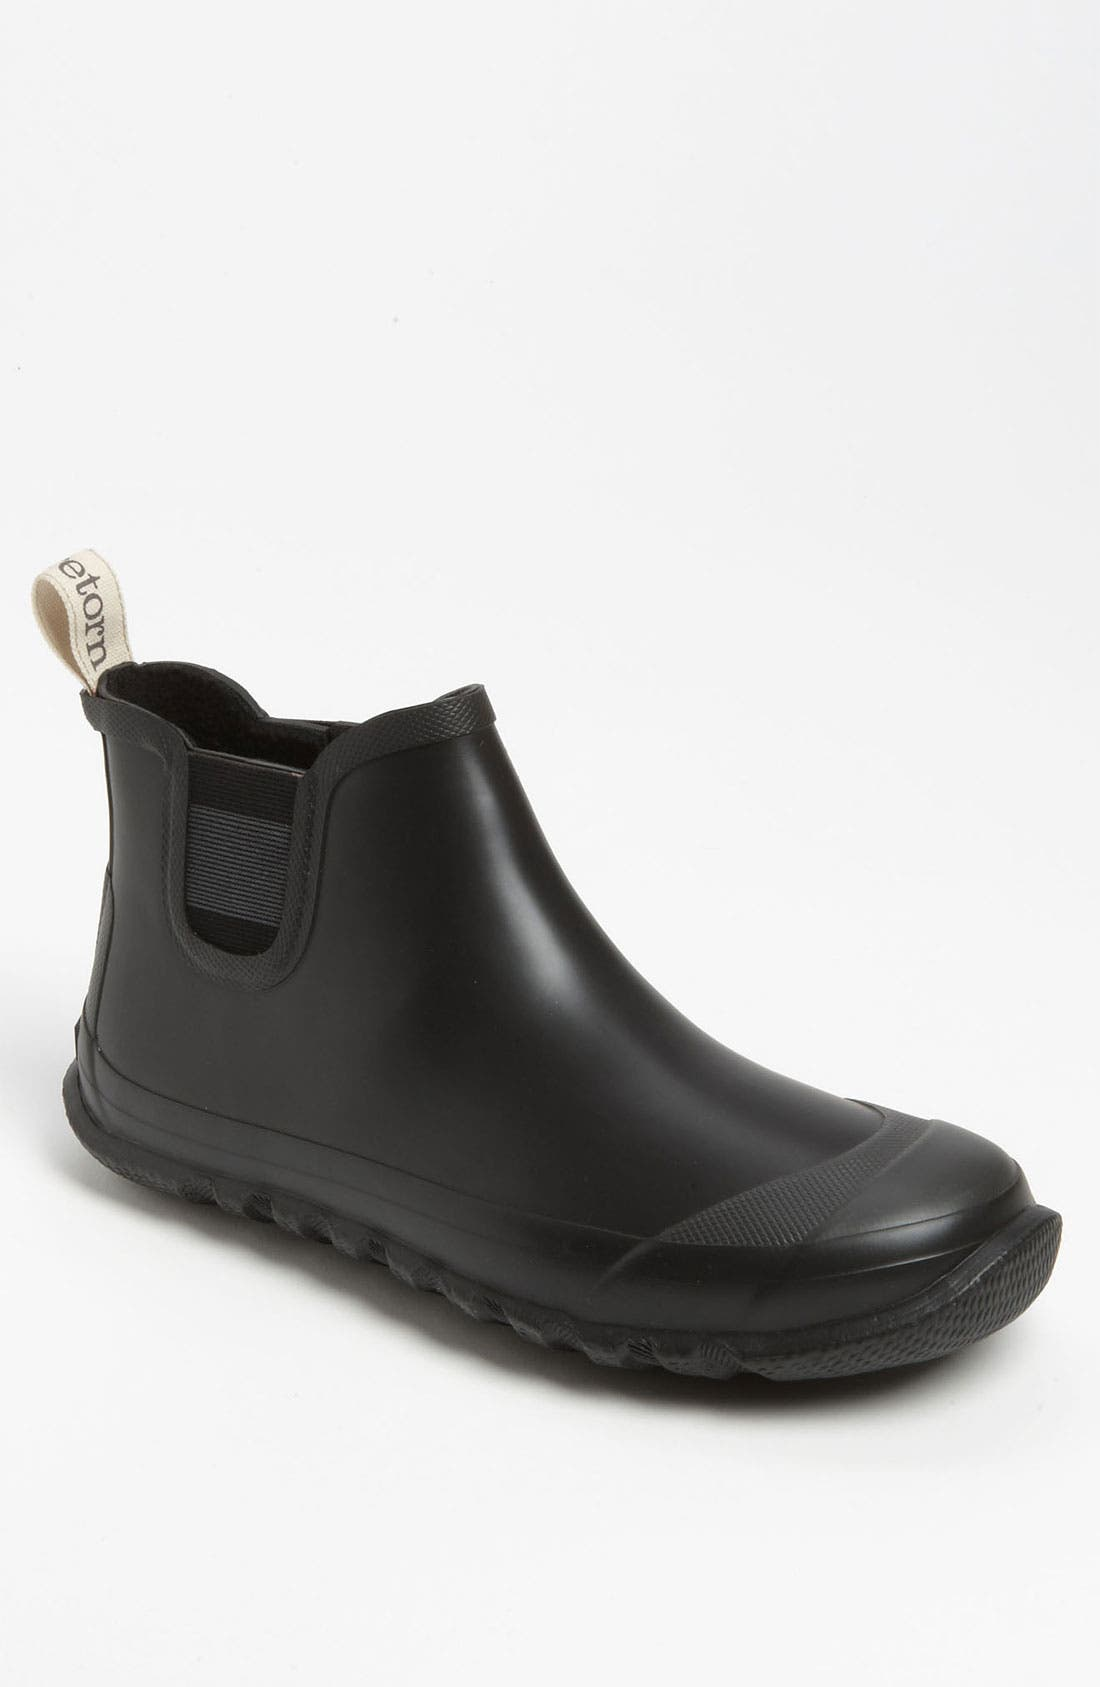 Alternate Image 1 Selected - Tretorn 'Årsta' Rain Boot